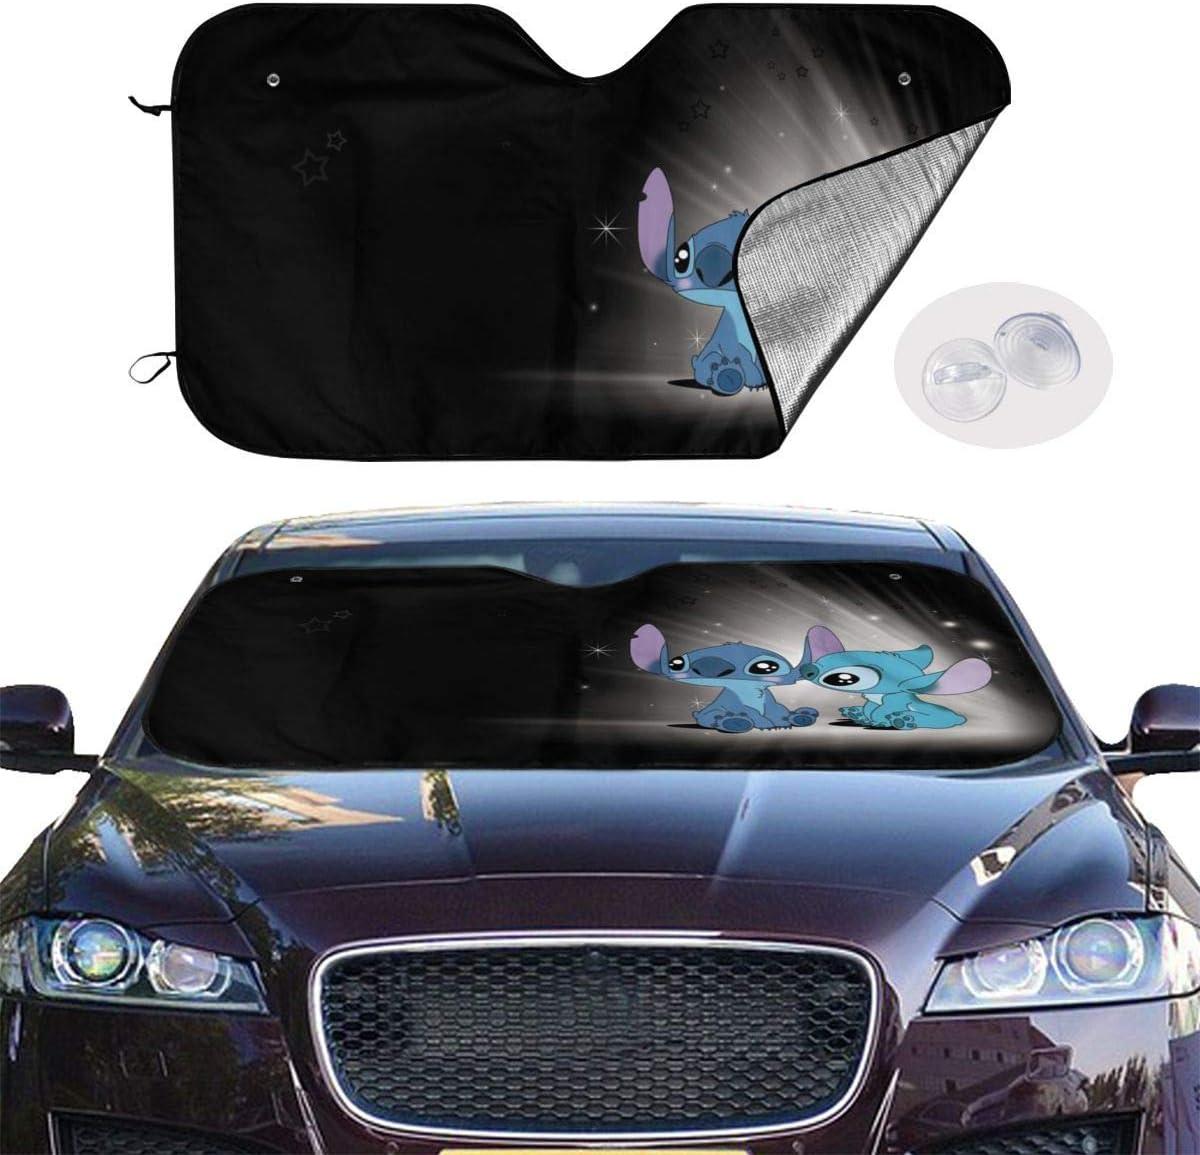 GFHTH Lilo Stitch Windshield Sun Shades Blocks UV Rays Sun Foldable Visor Car Universal Car Sunshades Shield Cover Protector with 4 Suction Cups 28x50 Inch